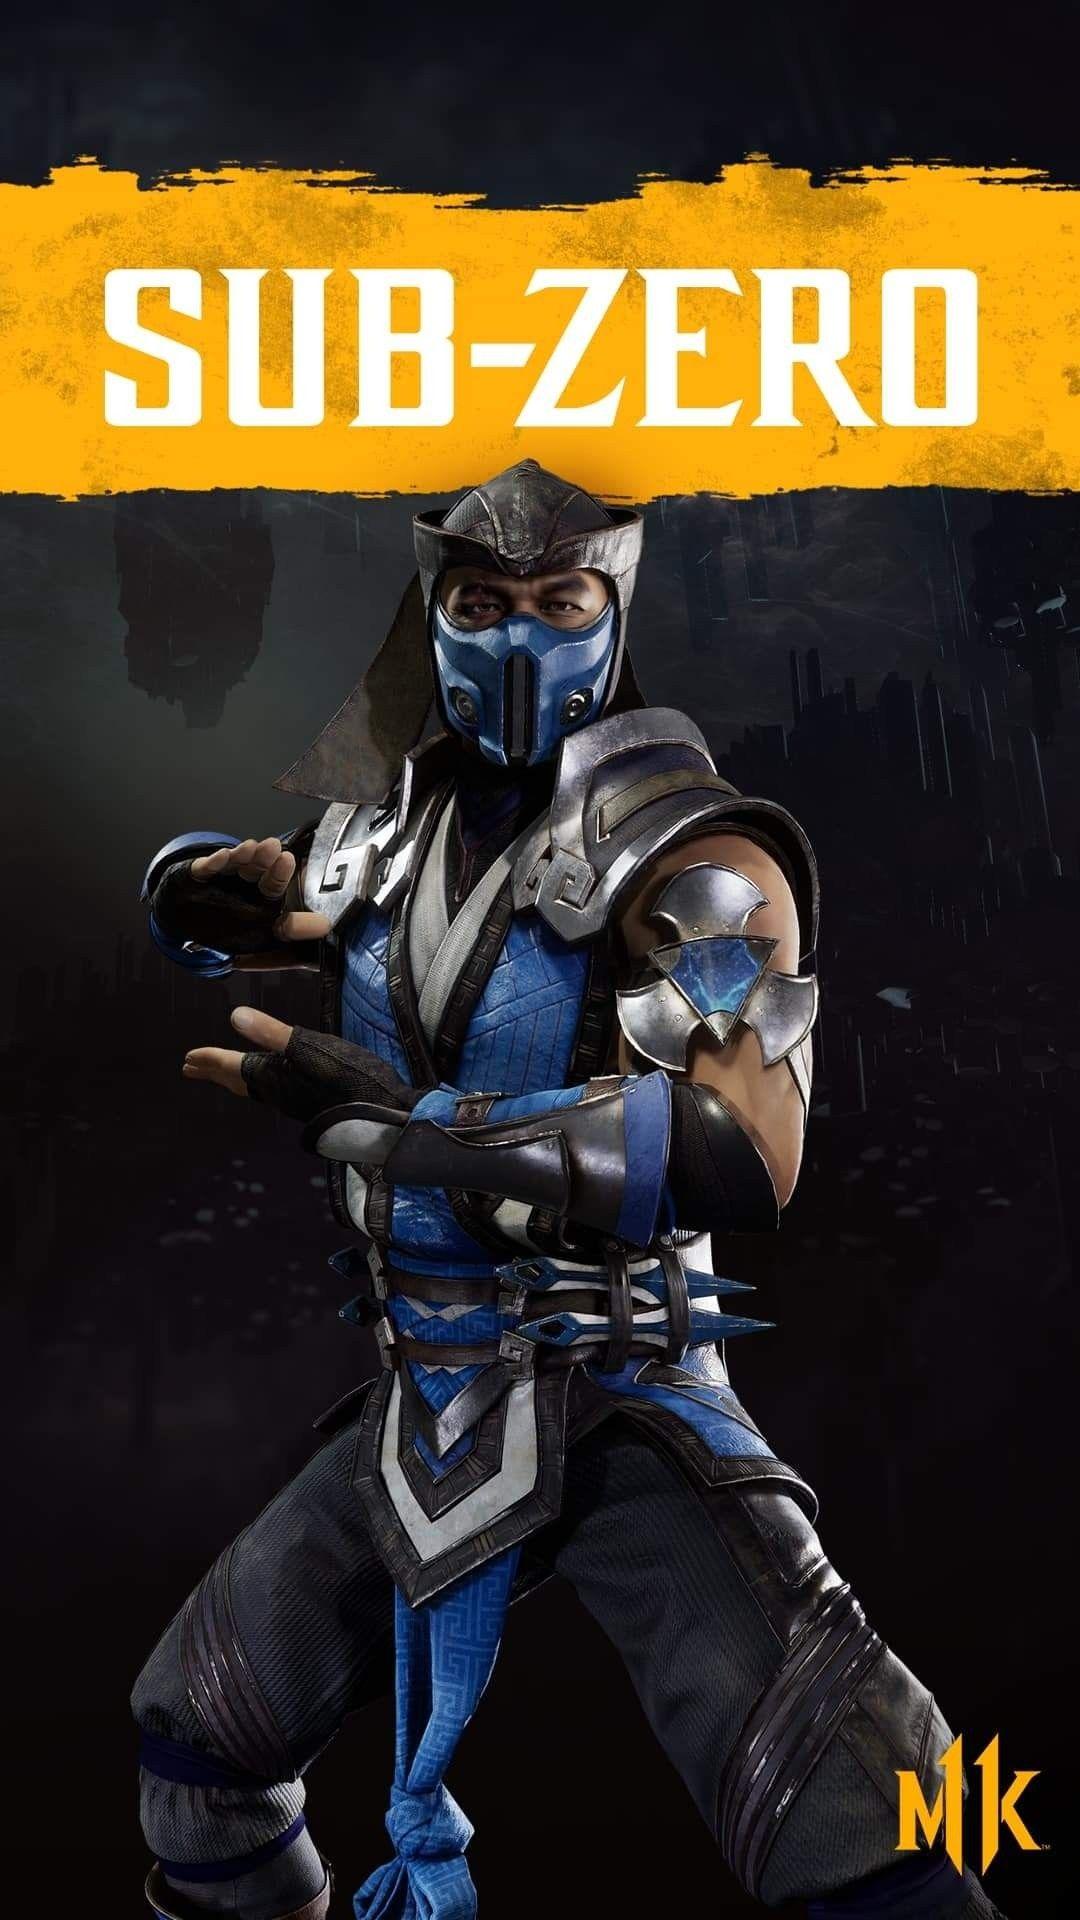 SubZero Mortal kombat characters, Sub zero mortal